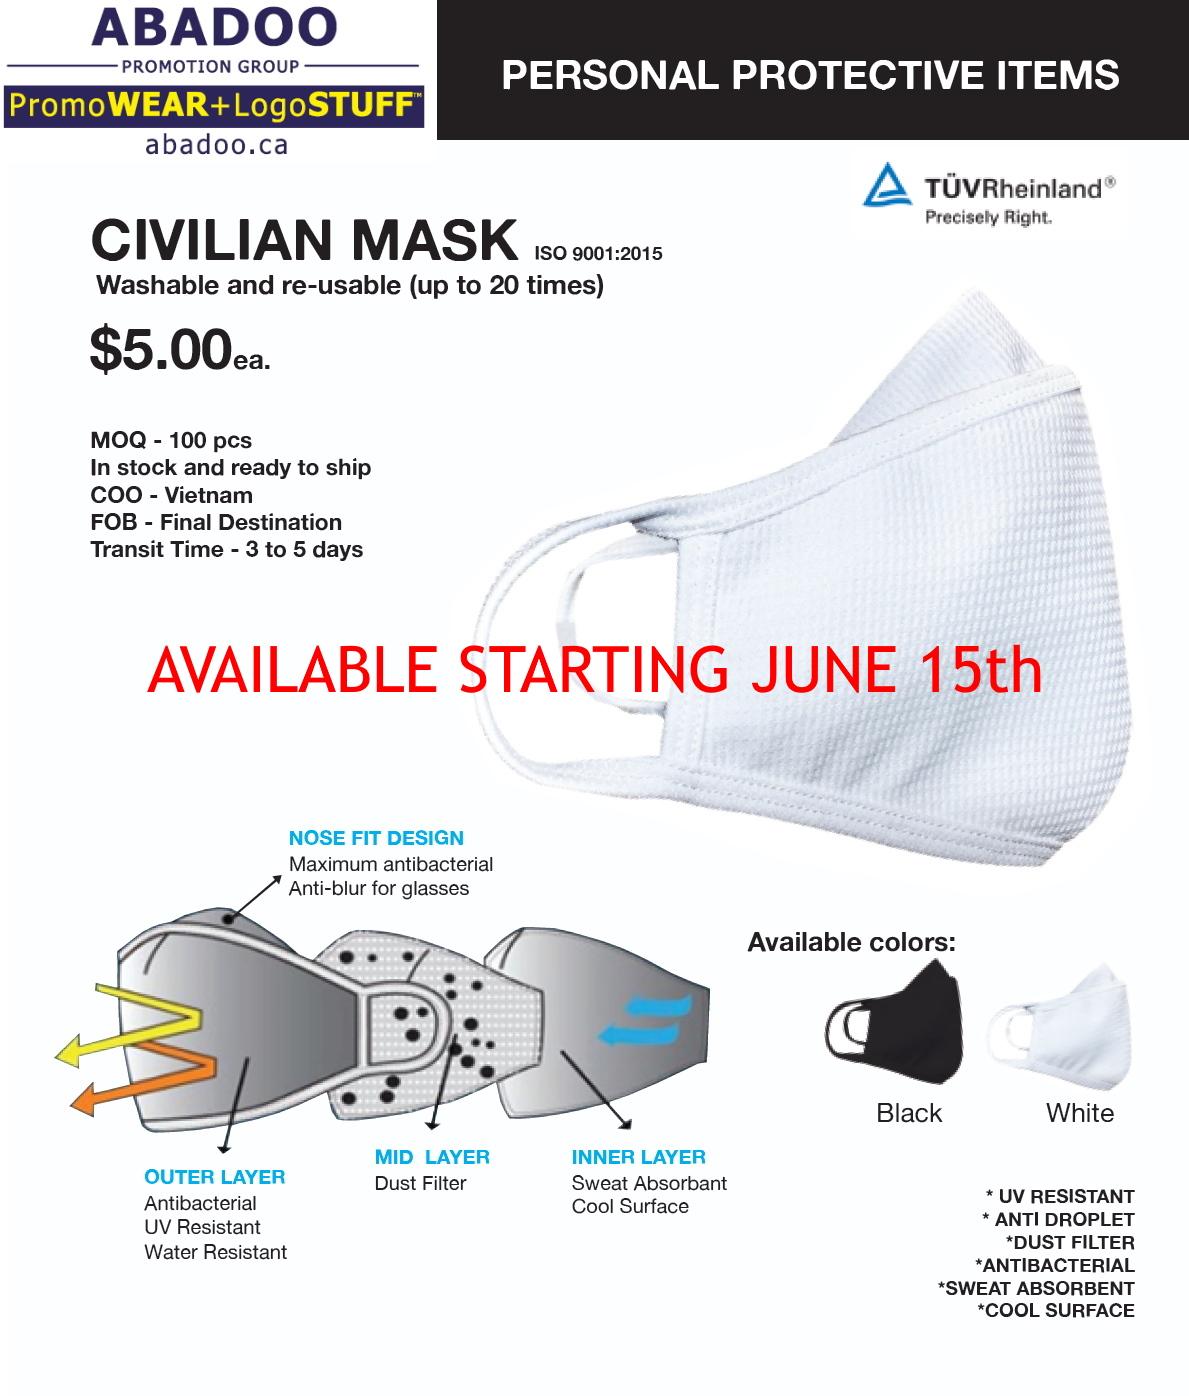 ABADOO Promo PPE Civilian Mask